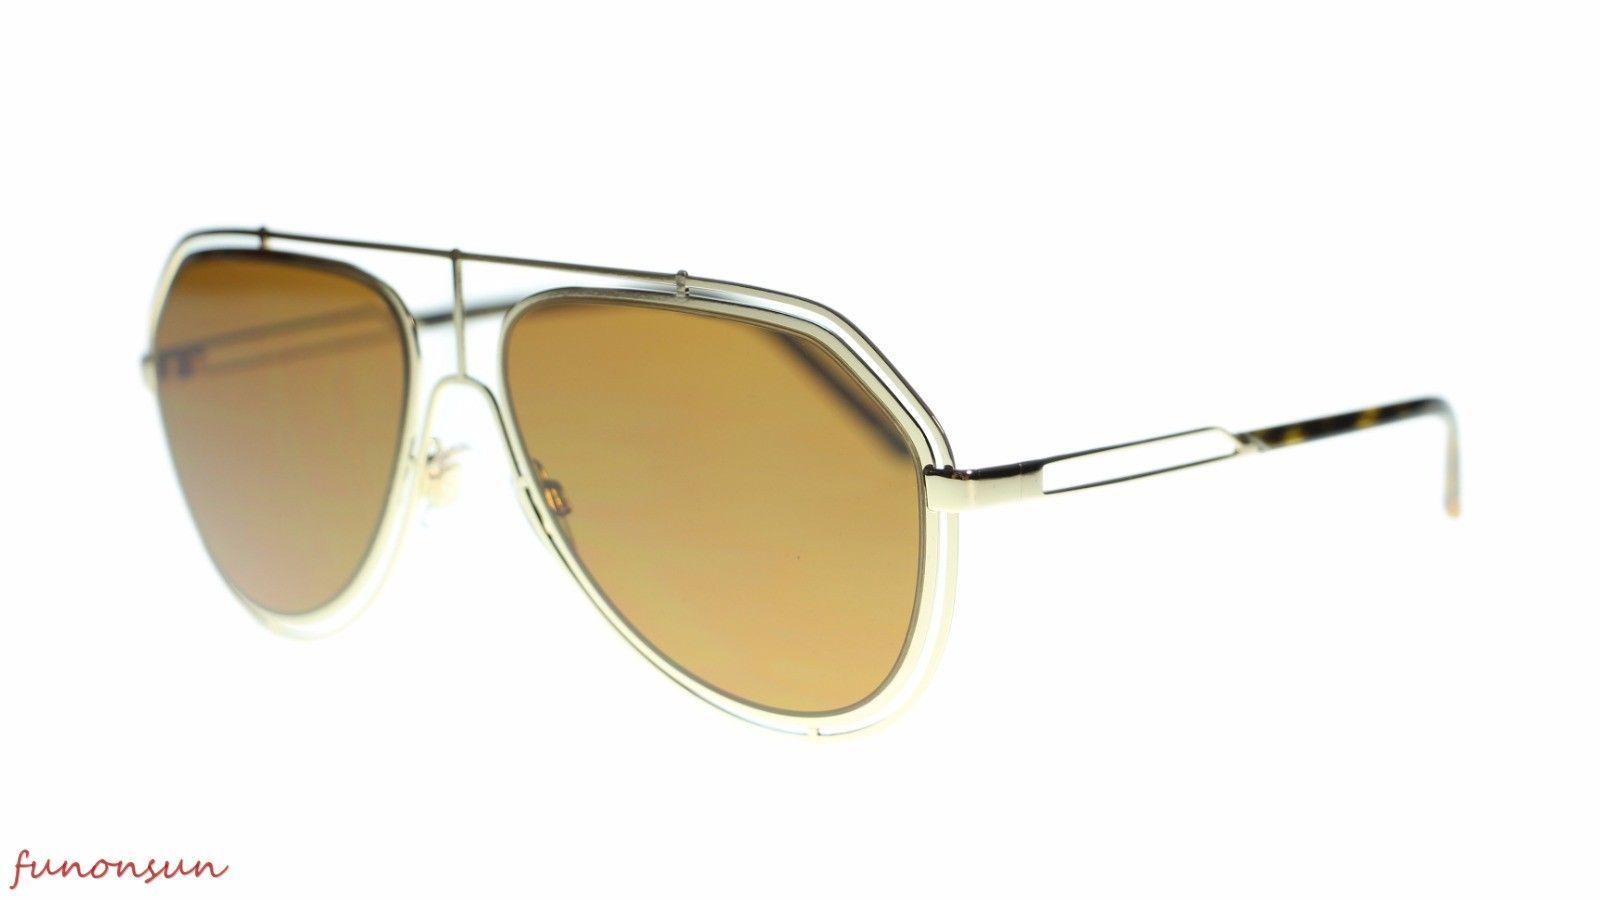 6c6fba26010 Dolce Gabbana Men s Pilot Sunglasses DG2175 and 50 similar items. S l1600